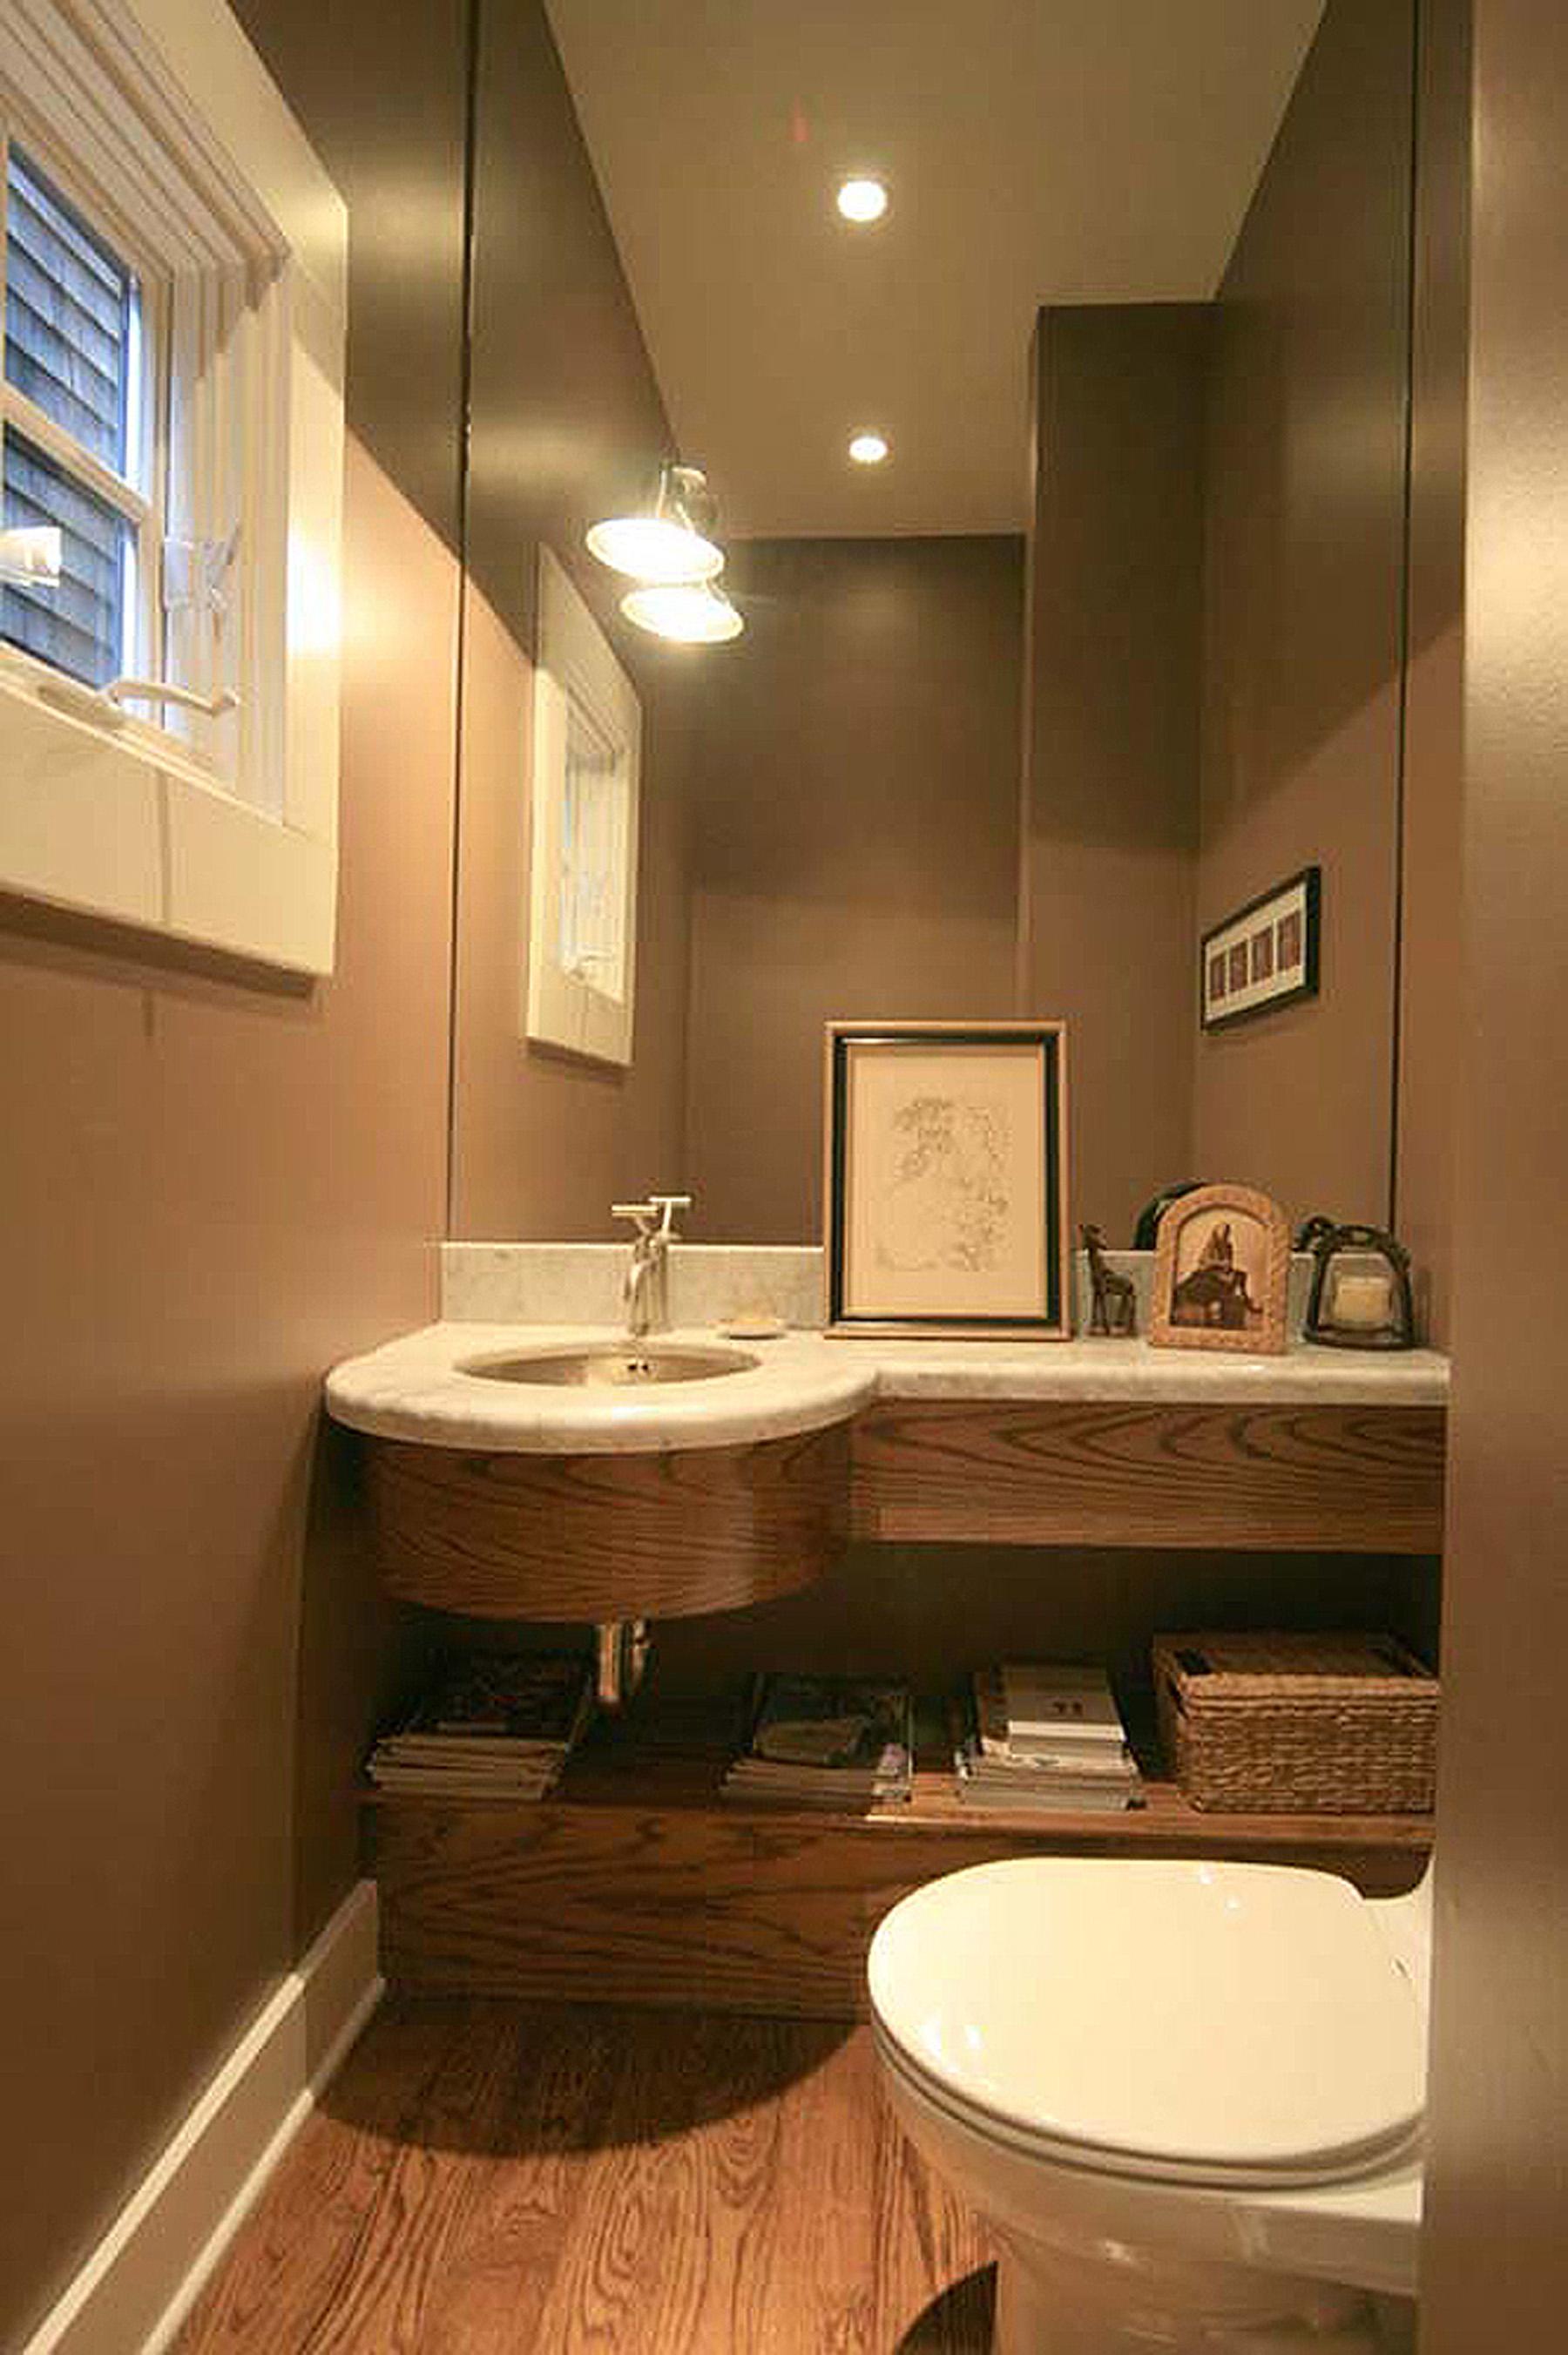 6 - 212 Bathroom.jpg